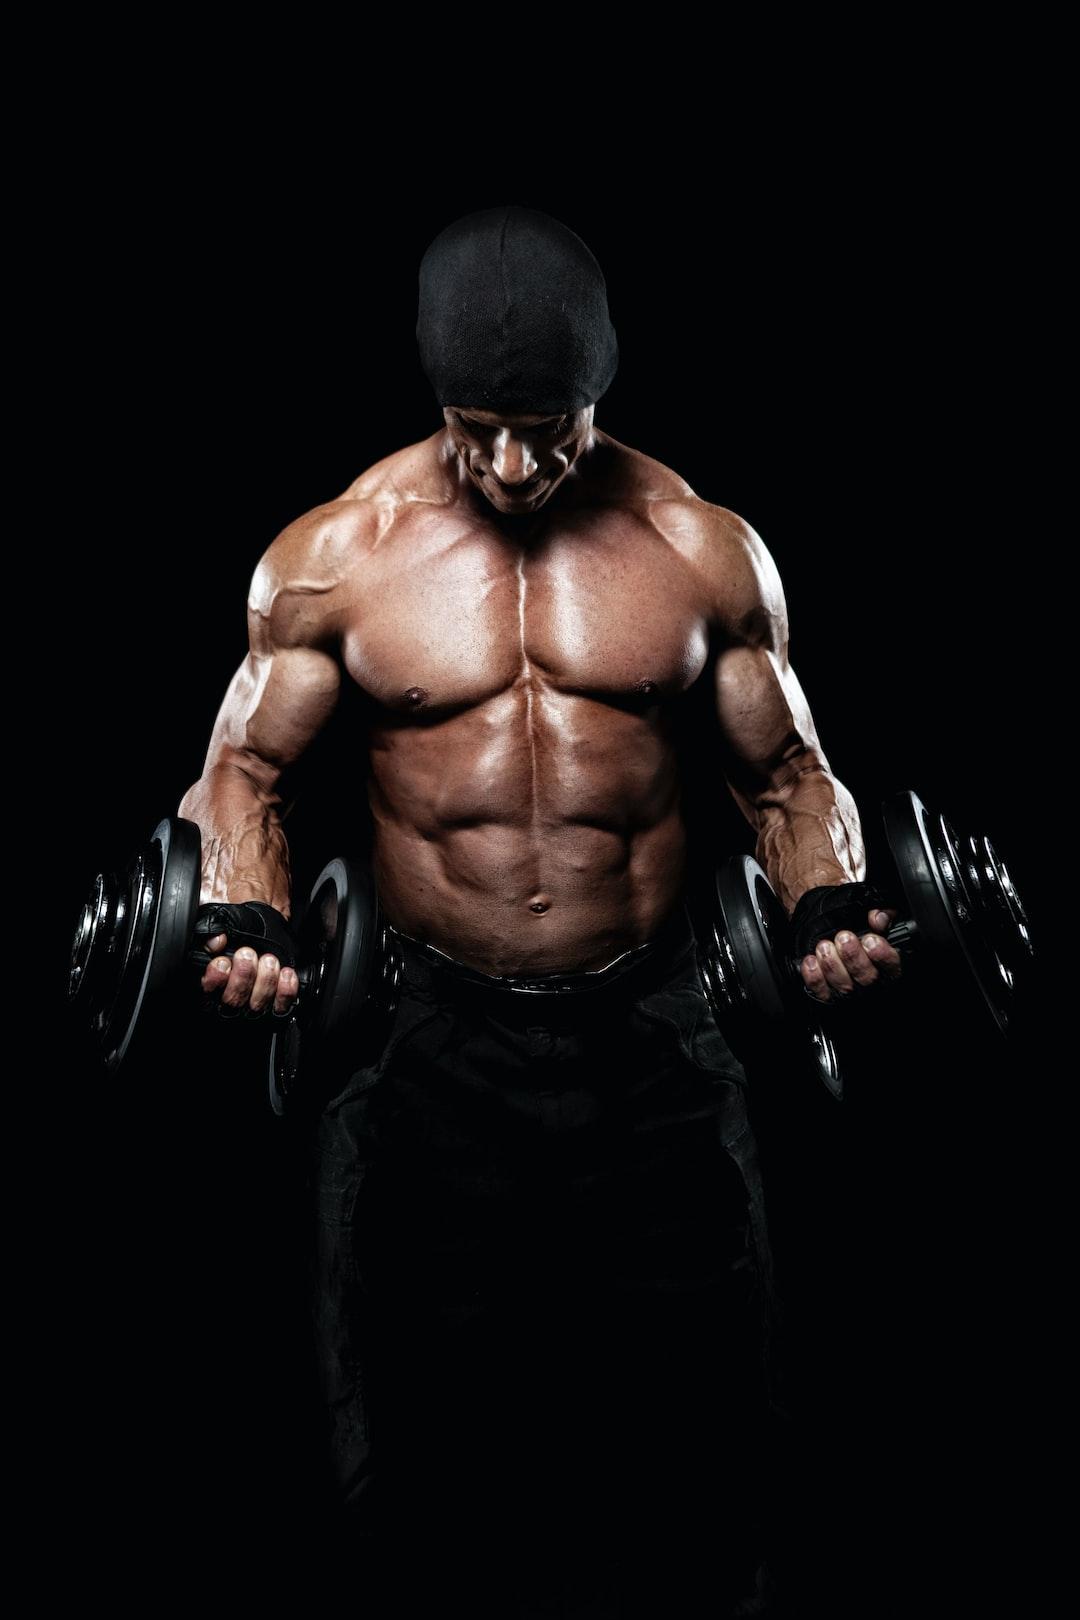 Muscular bodybuilder lifting dumbbells.